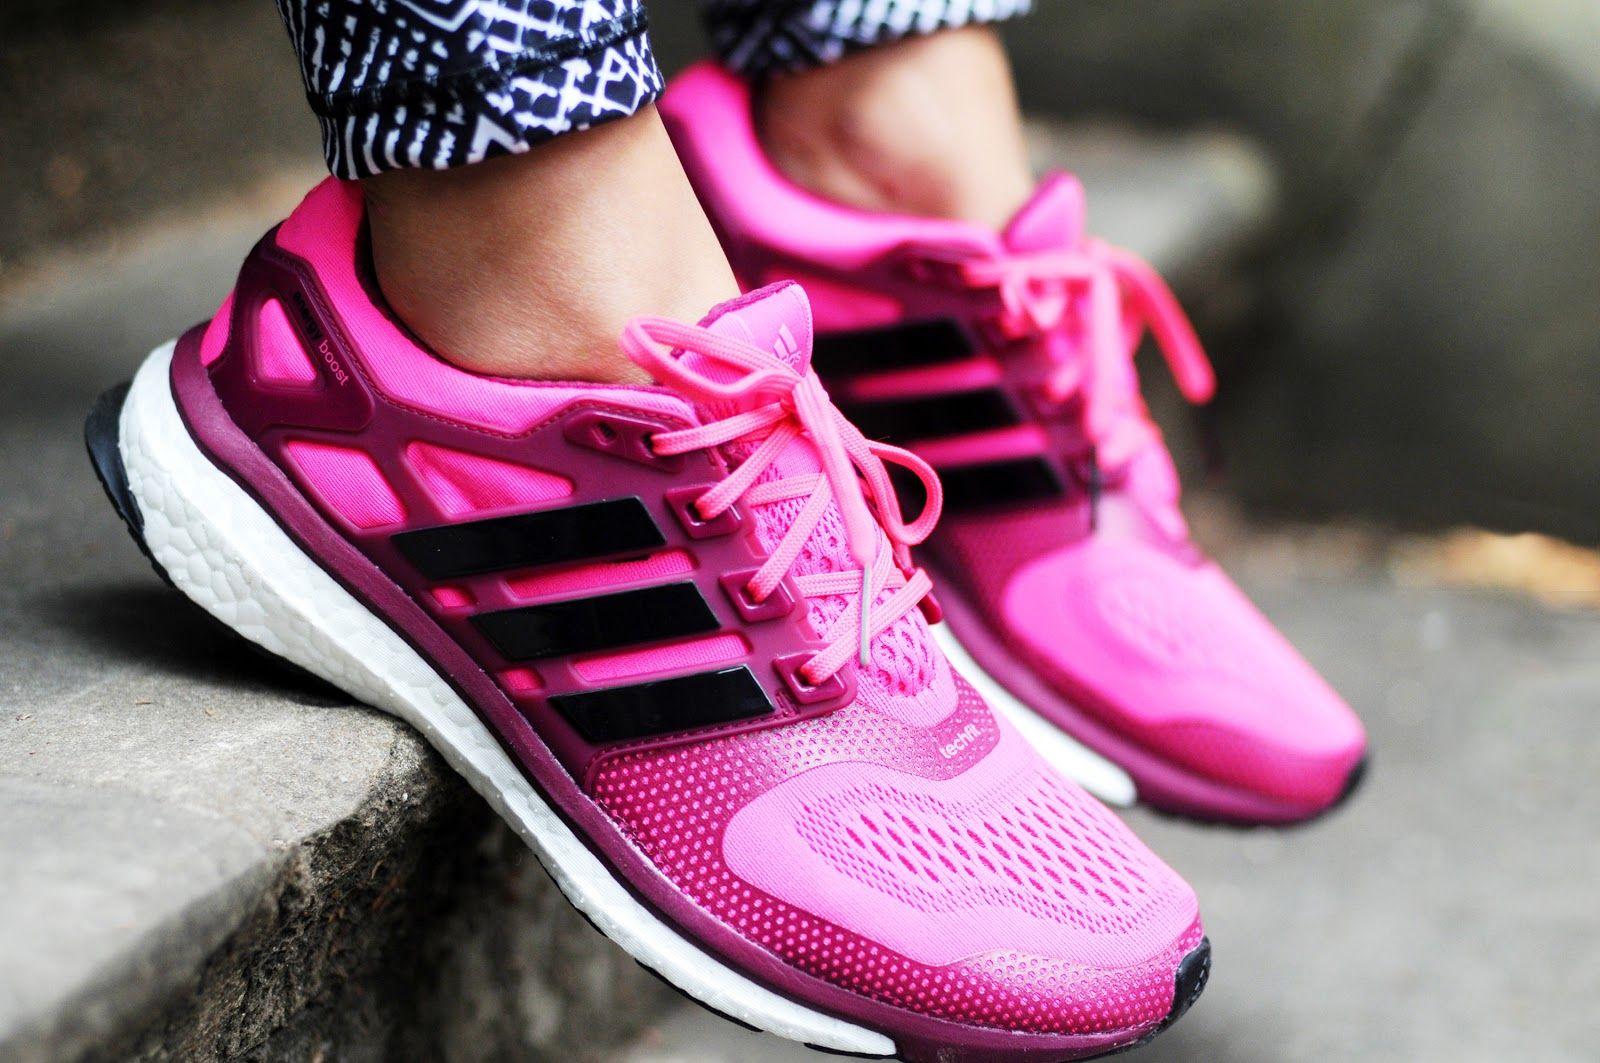 retirarse tolerancia años  Běžecké boty adidas energy boost 2 ESM w M29746 | Adidas shoes women, Adidas  women, Adidas